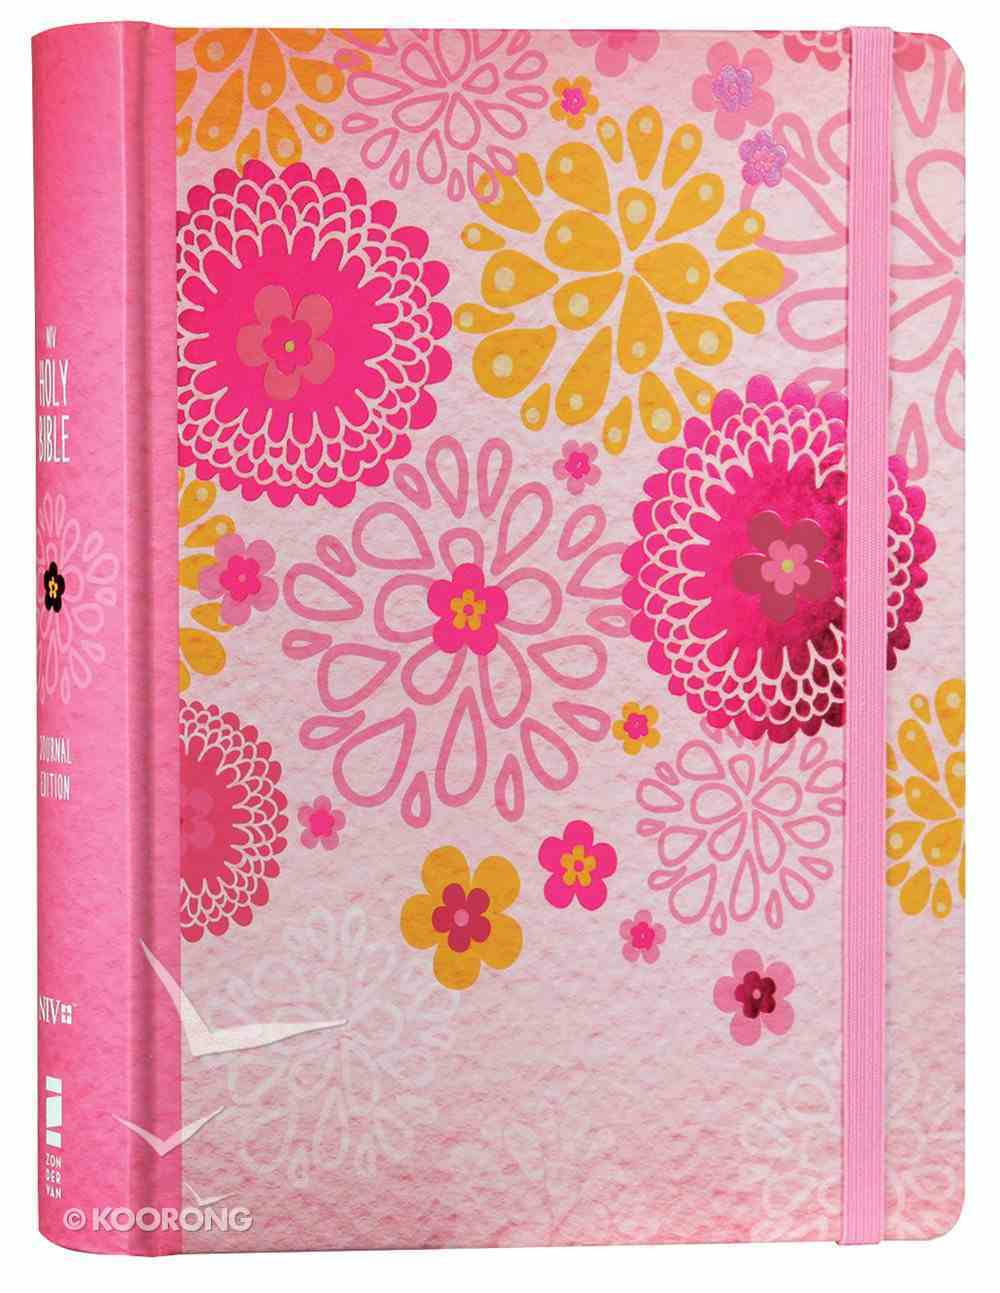 NIV Holy Bible For Girls Journal Edition Pink Elastic Closure (Black Letter Edition) Hardback